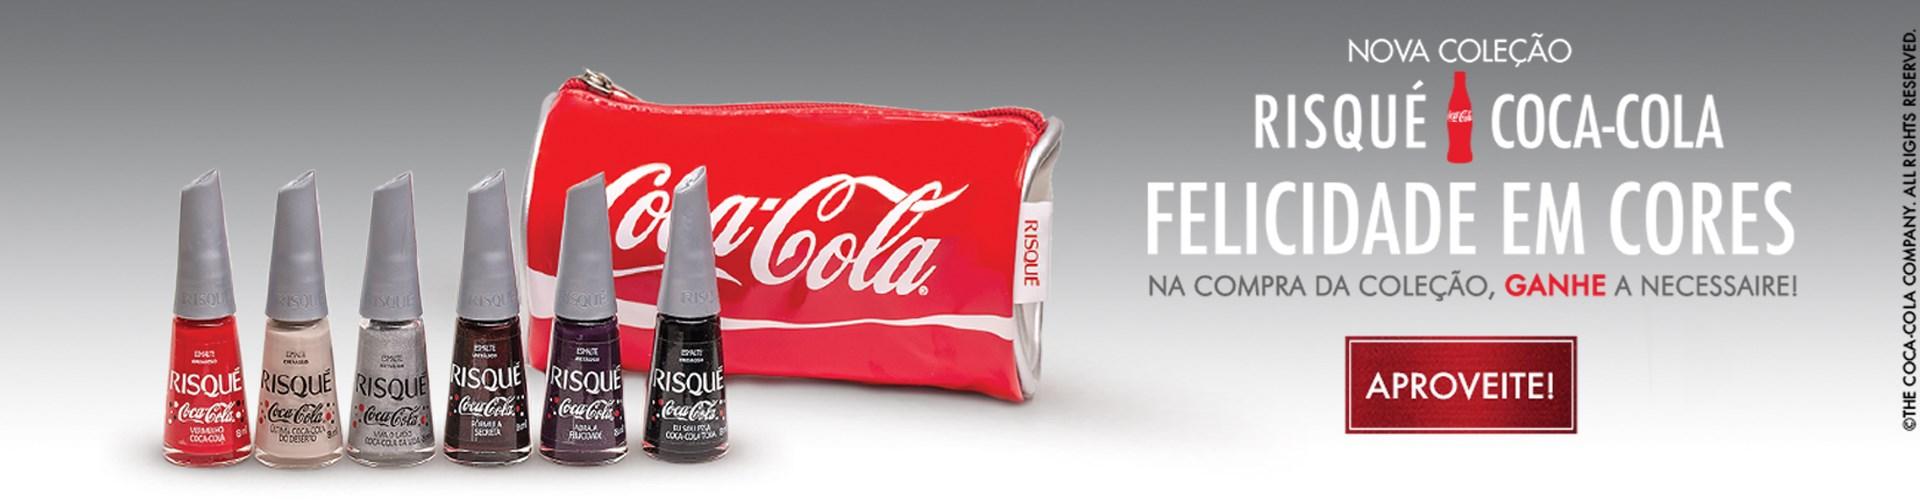 Risqué Coca-Cola